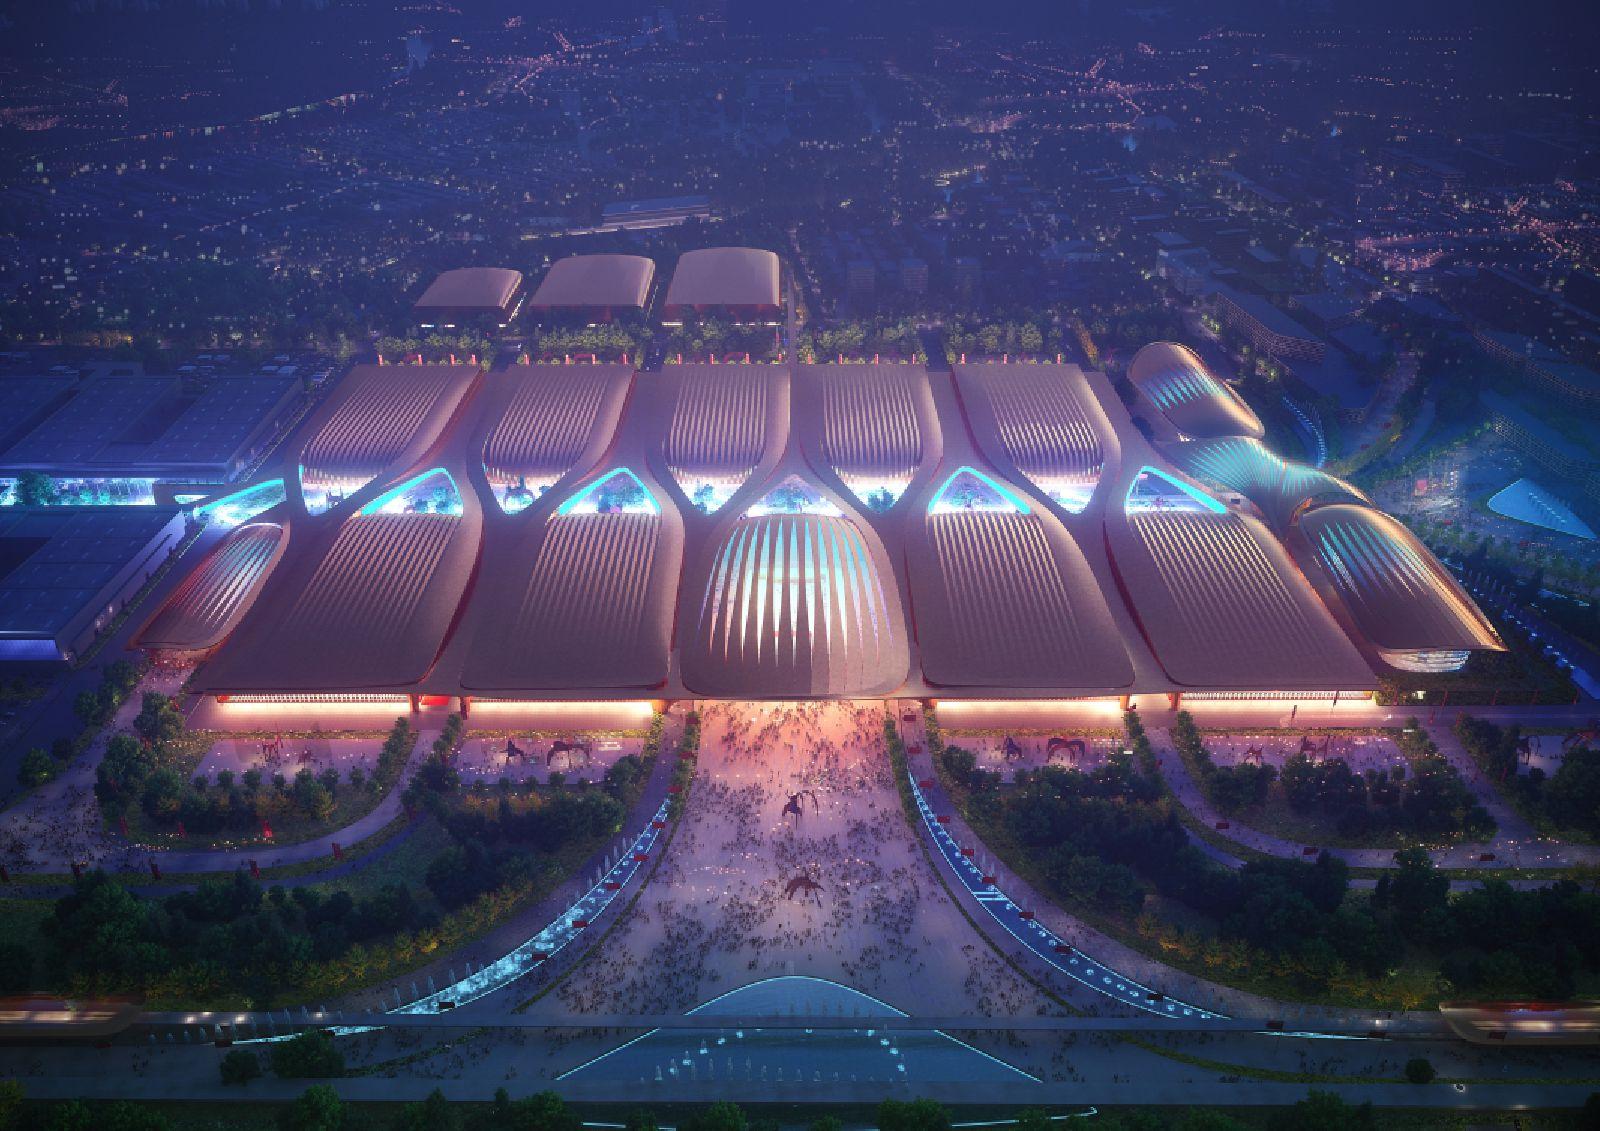 Beijing's International Exhibition Centre